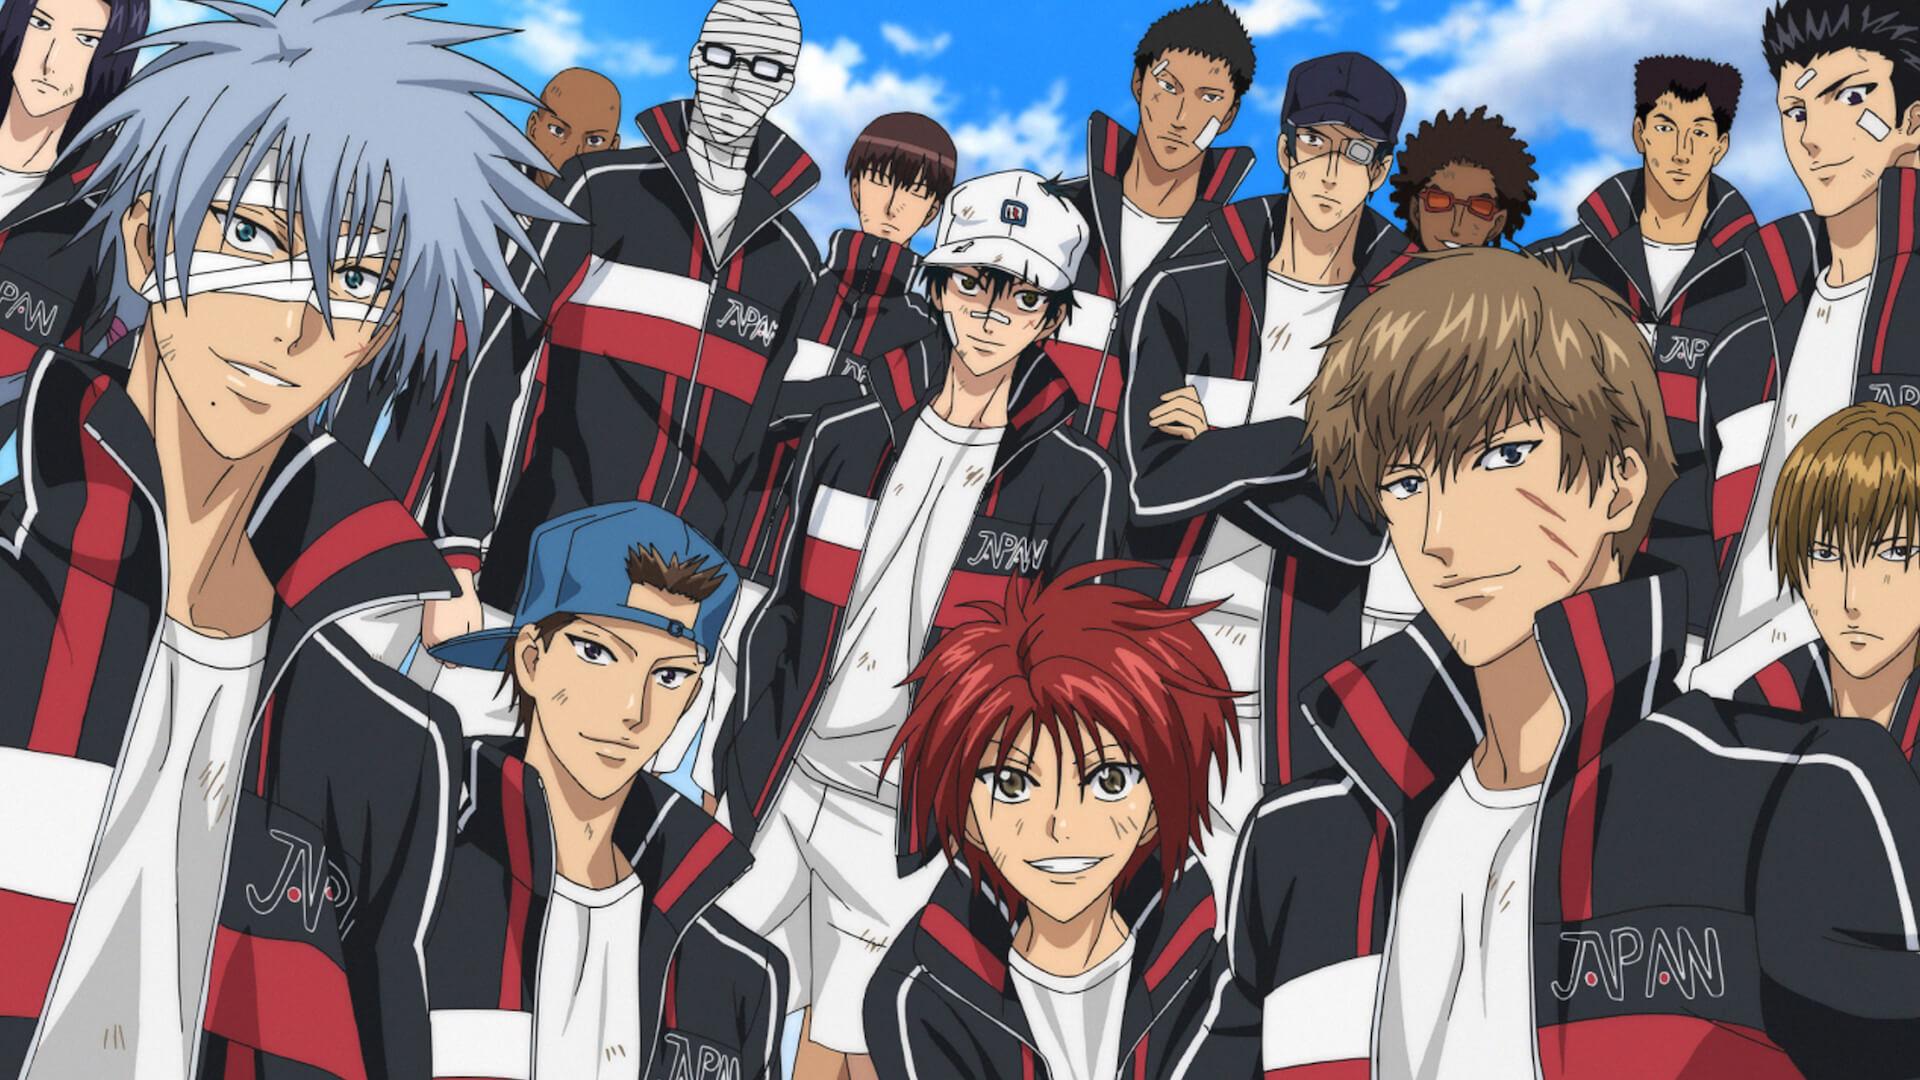 『SHAMAN KING』、『極主夫道』、『転スラ日記』など話題作目白押し!Netflix4月配信のアニメラインナップが解禁 art210326_netflix_anime_11